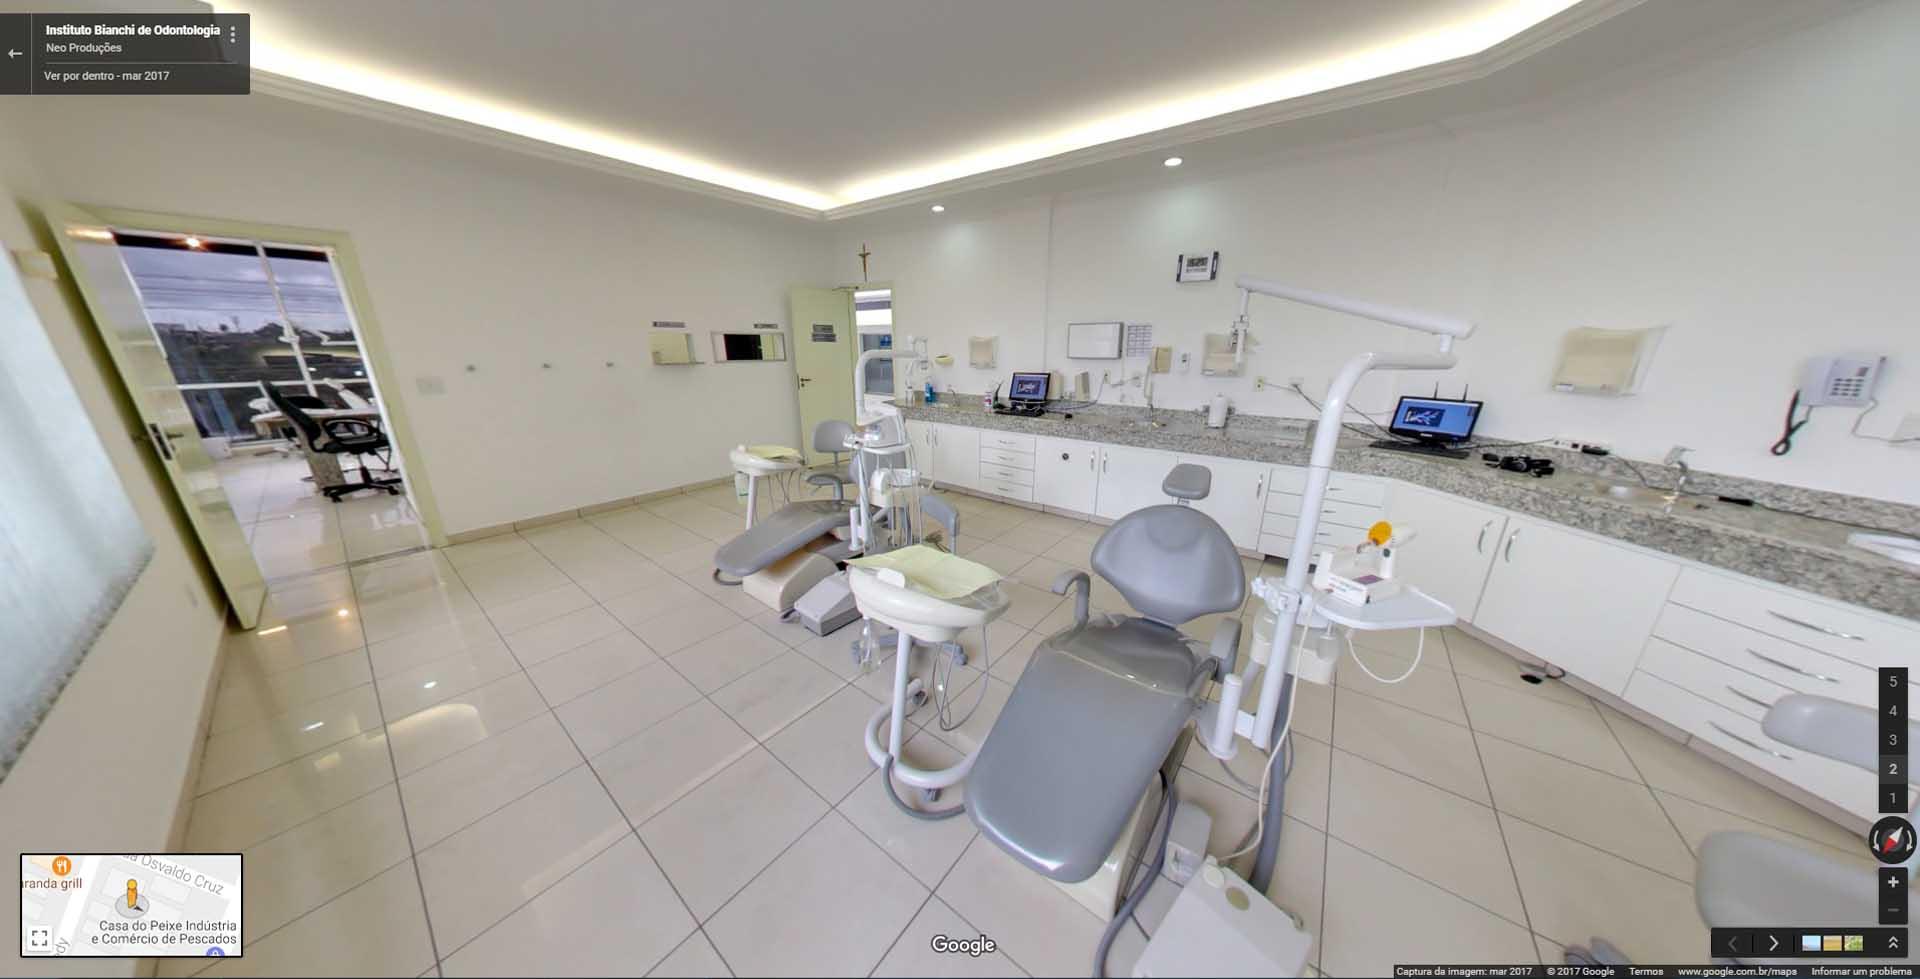 Inst. Bianchi de Odontologia